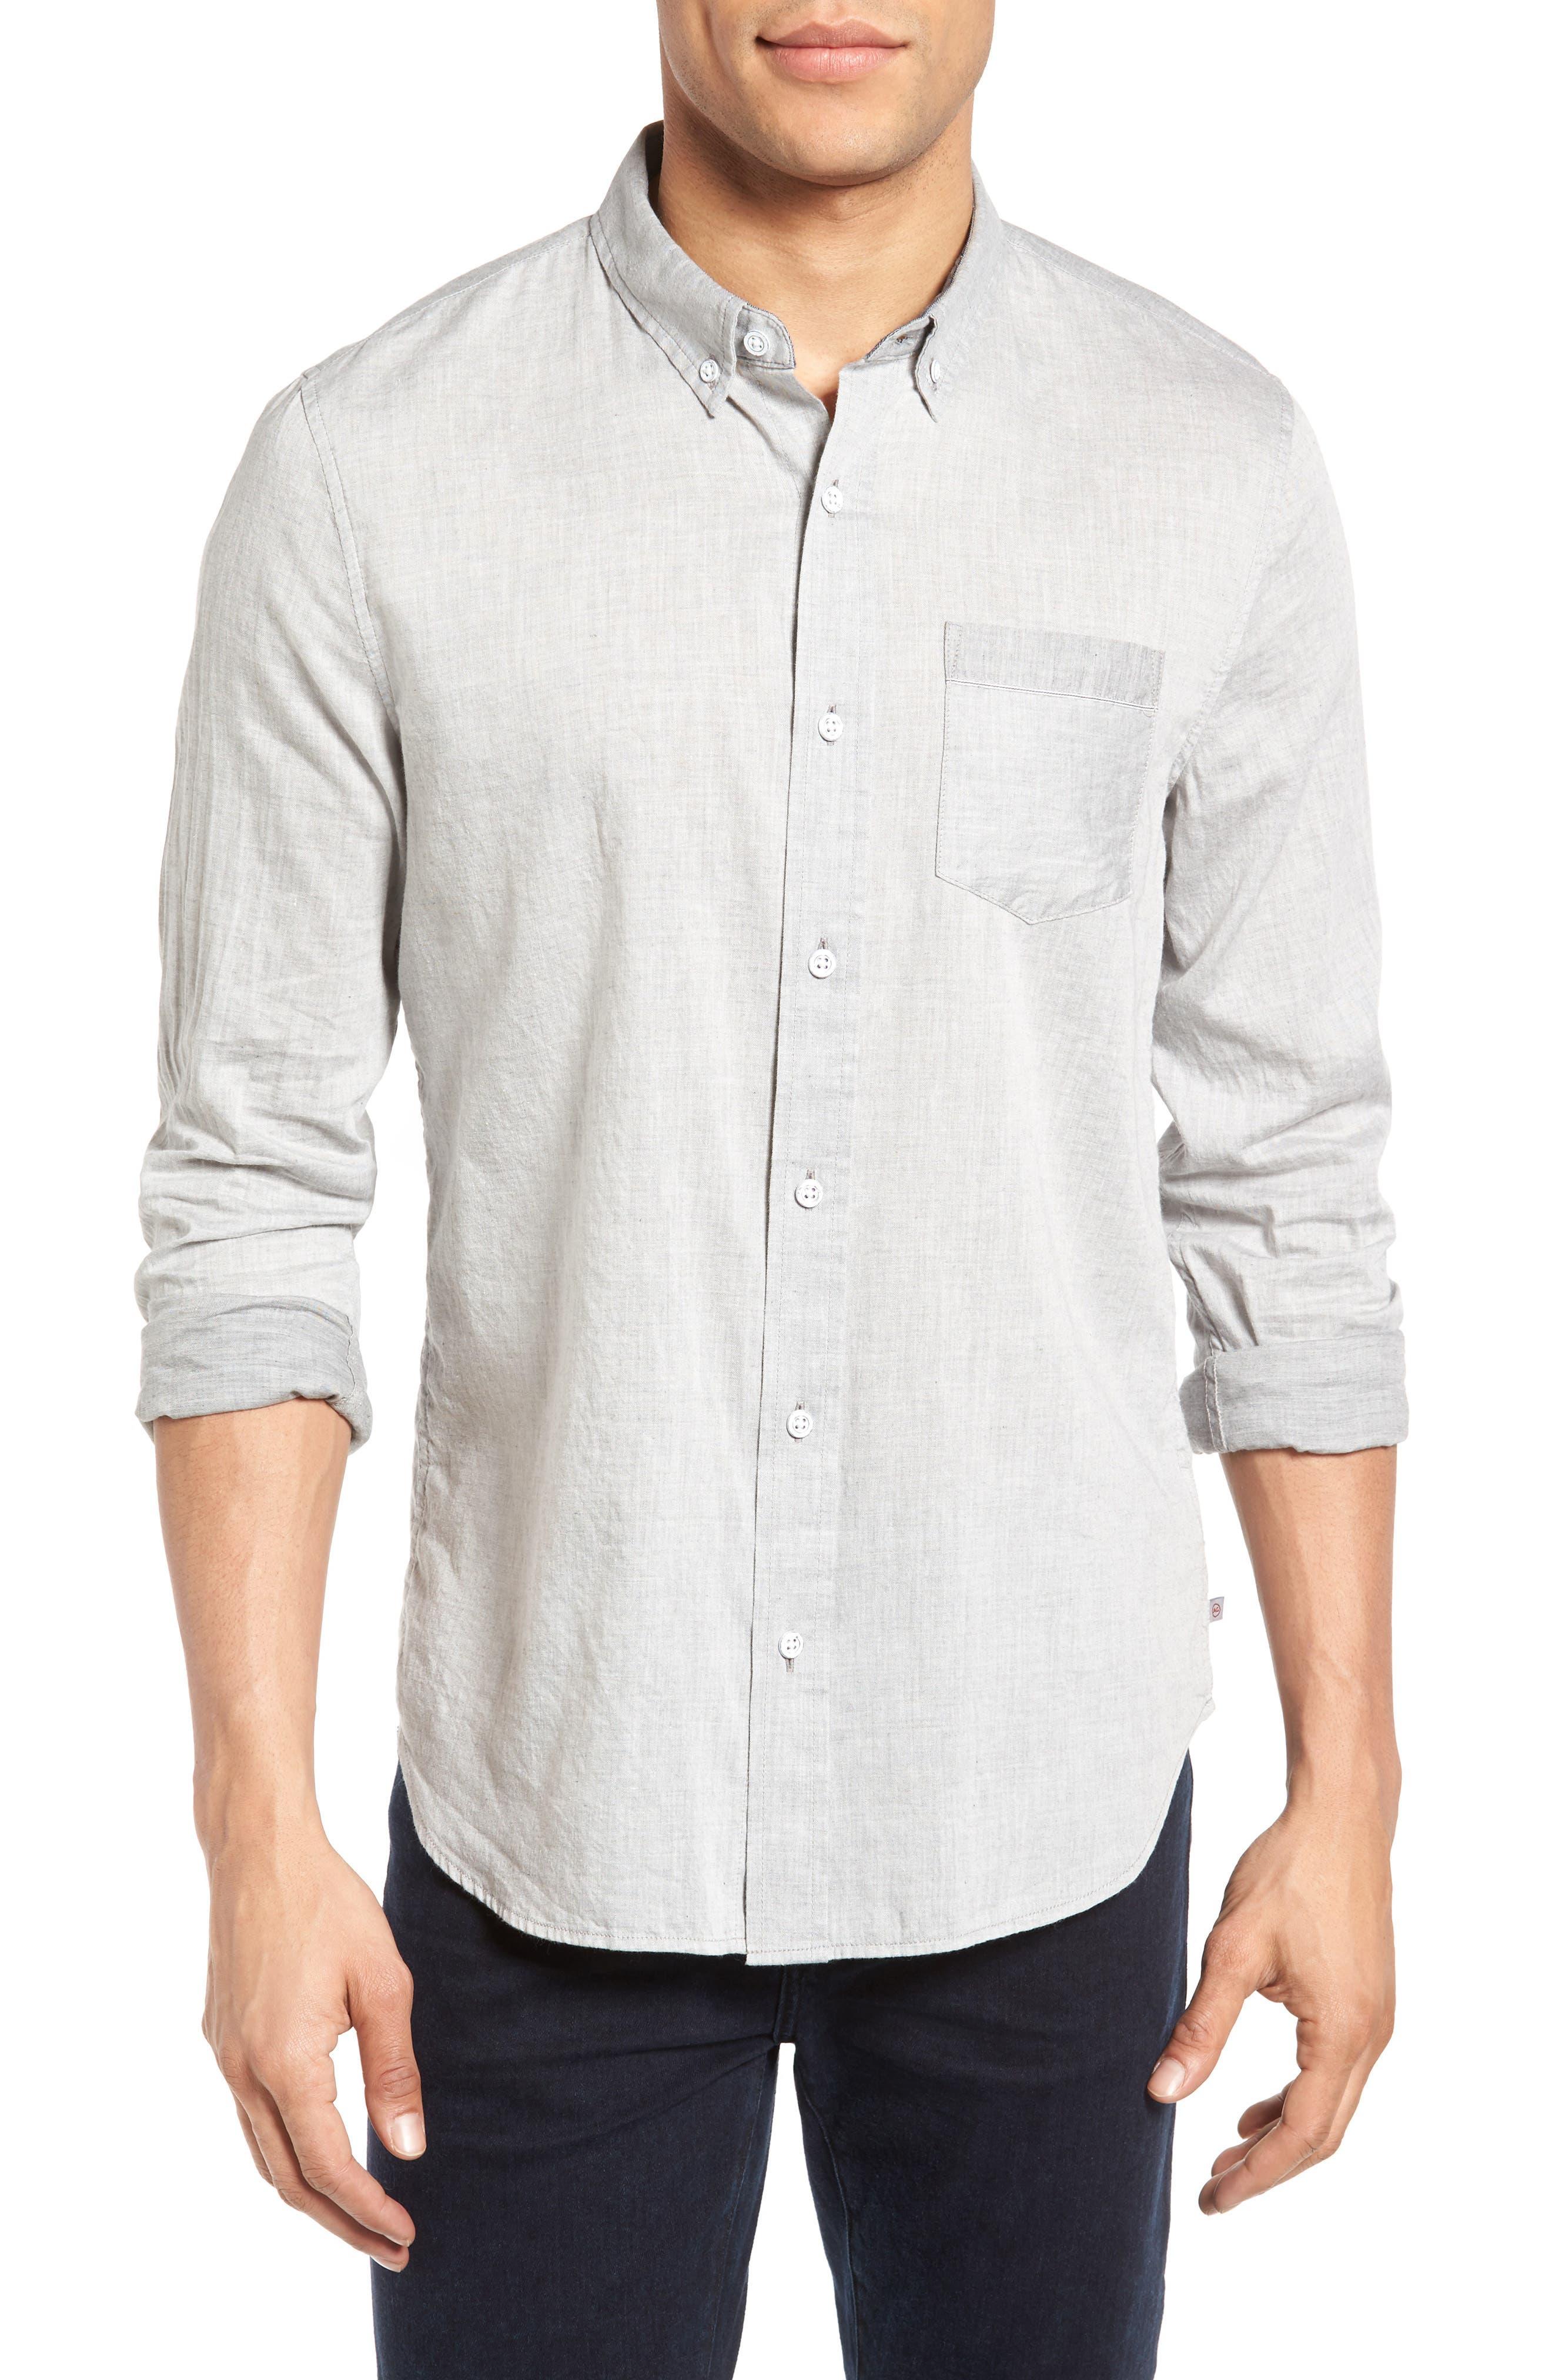 Alternate Image 1 Selected - AG Grady Trim Fit Sport Shirt